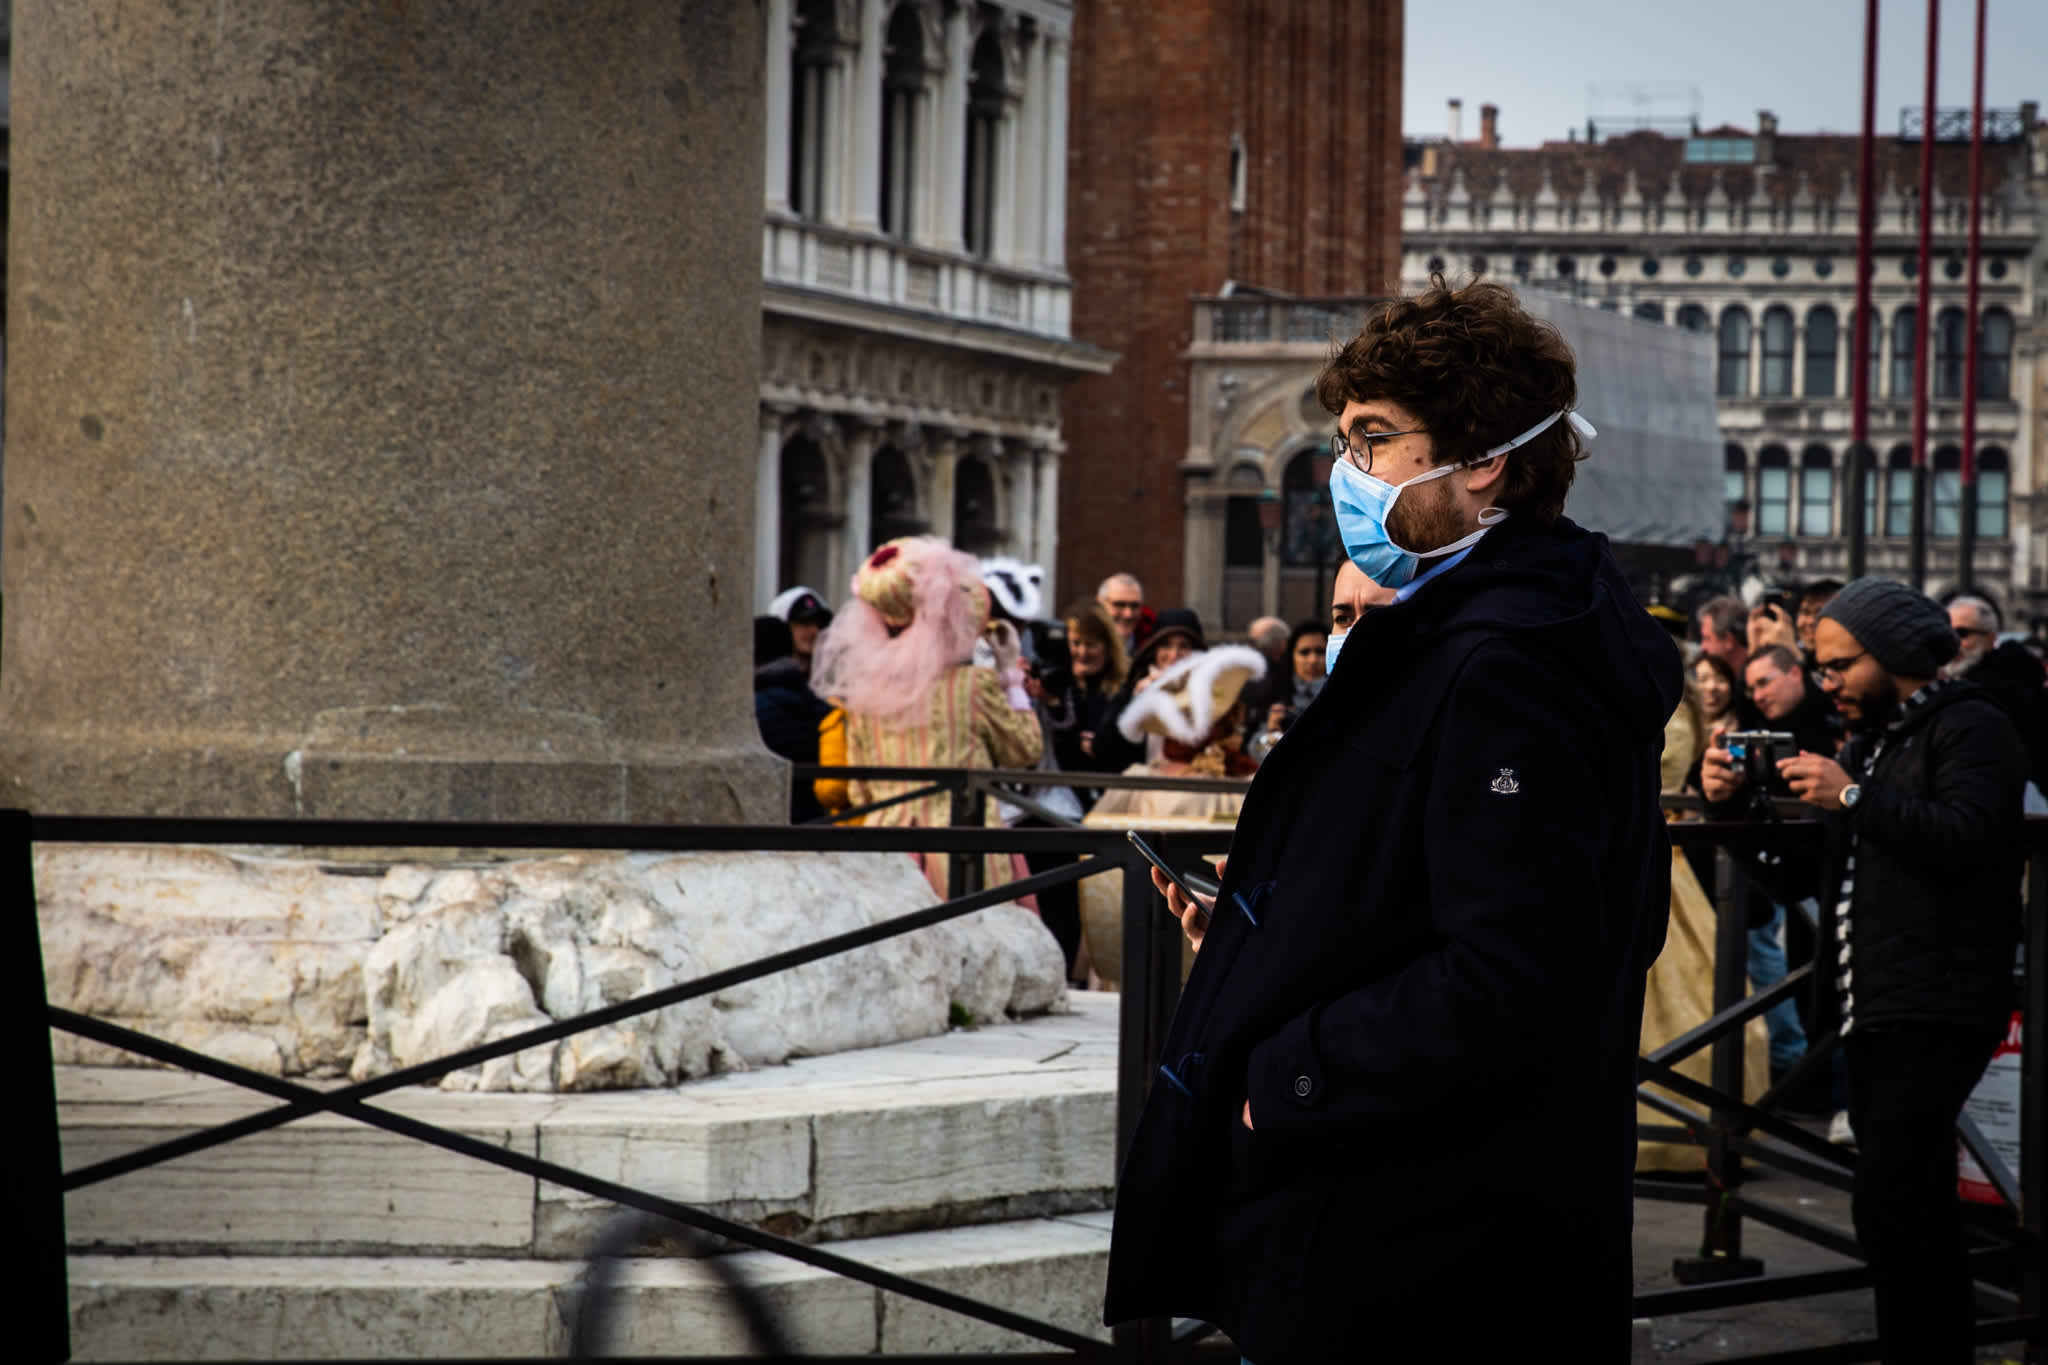 Austria says it will stop suspected coronavirus cases at its borders